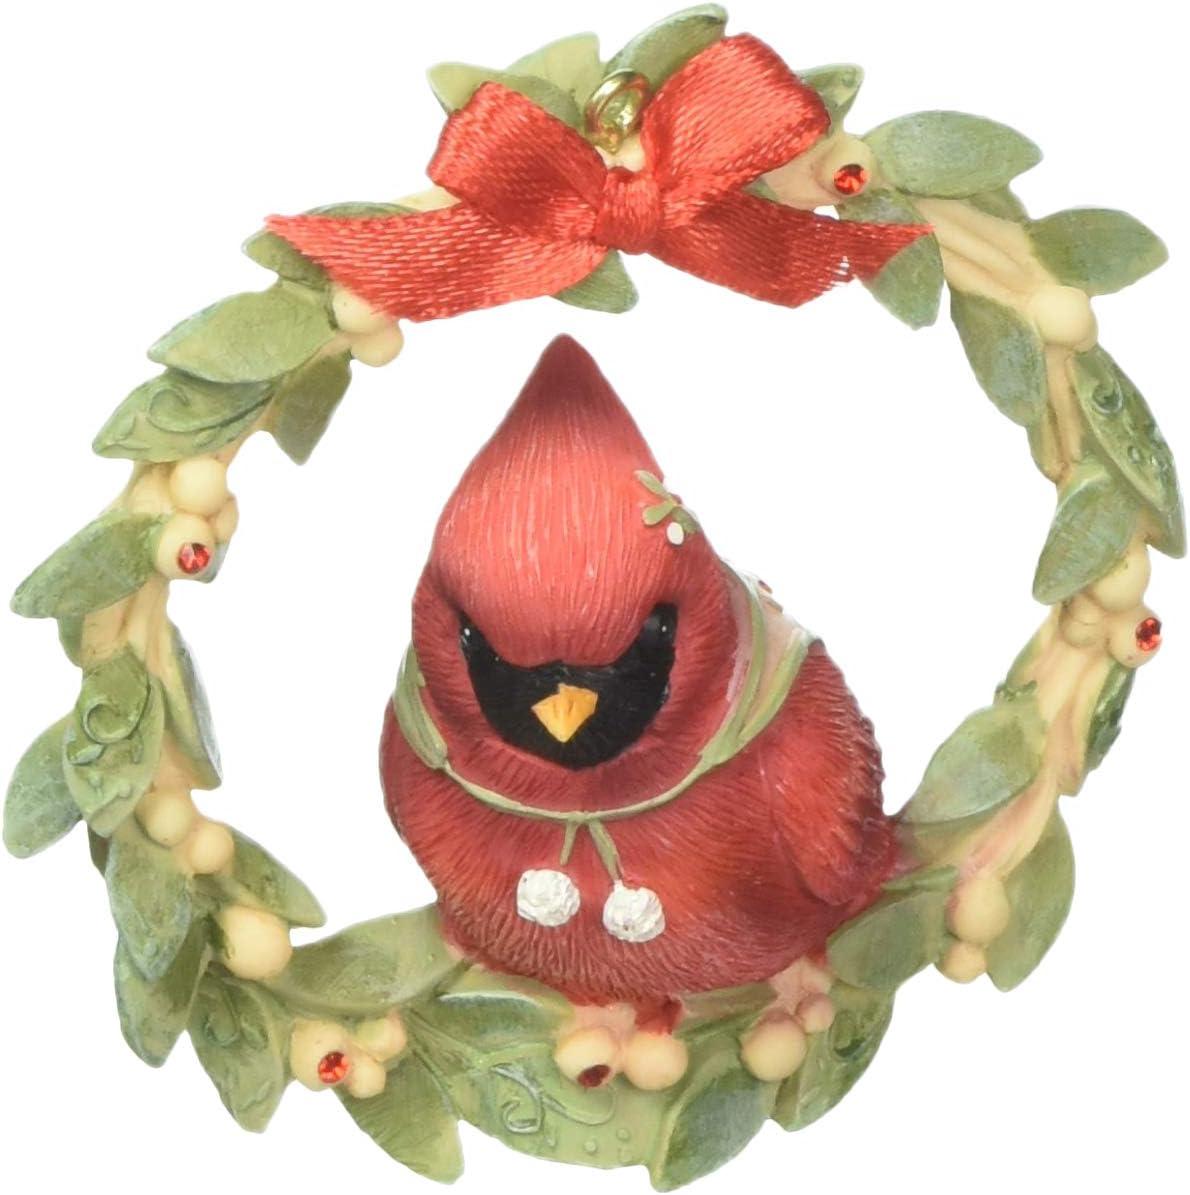 "Enesco Heart of Christmas Sweet Tweet Wreath Hanging Ornament, 3.27"", Multicolor"